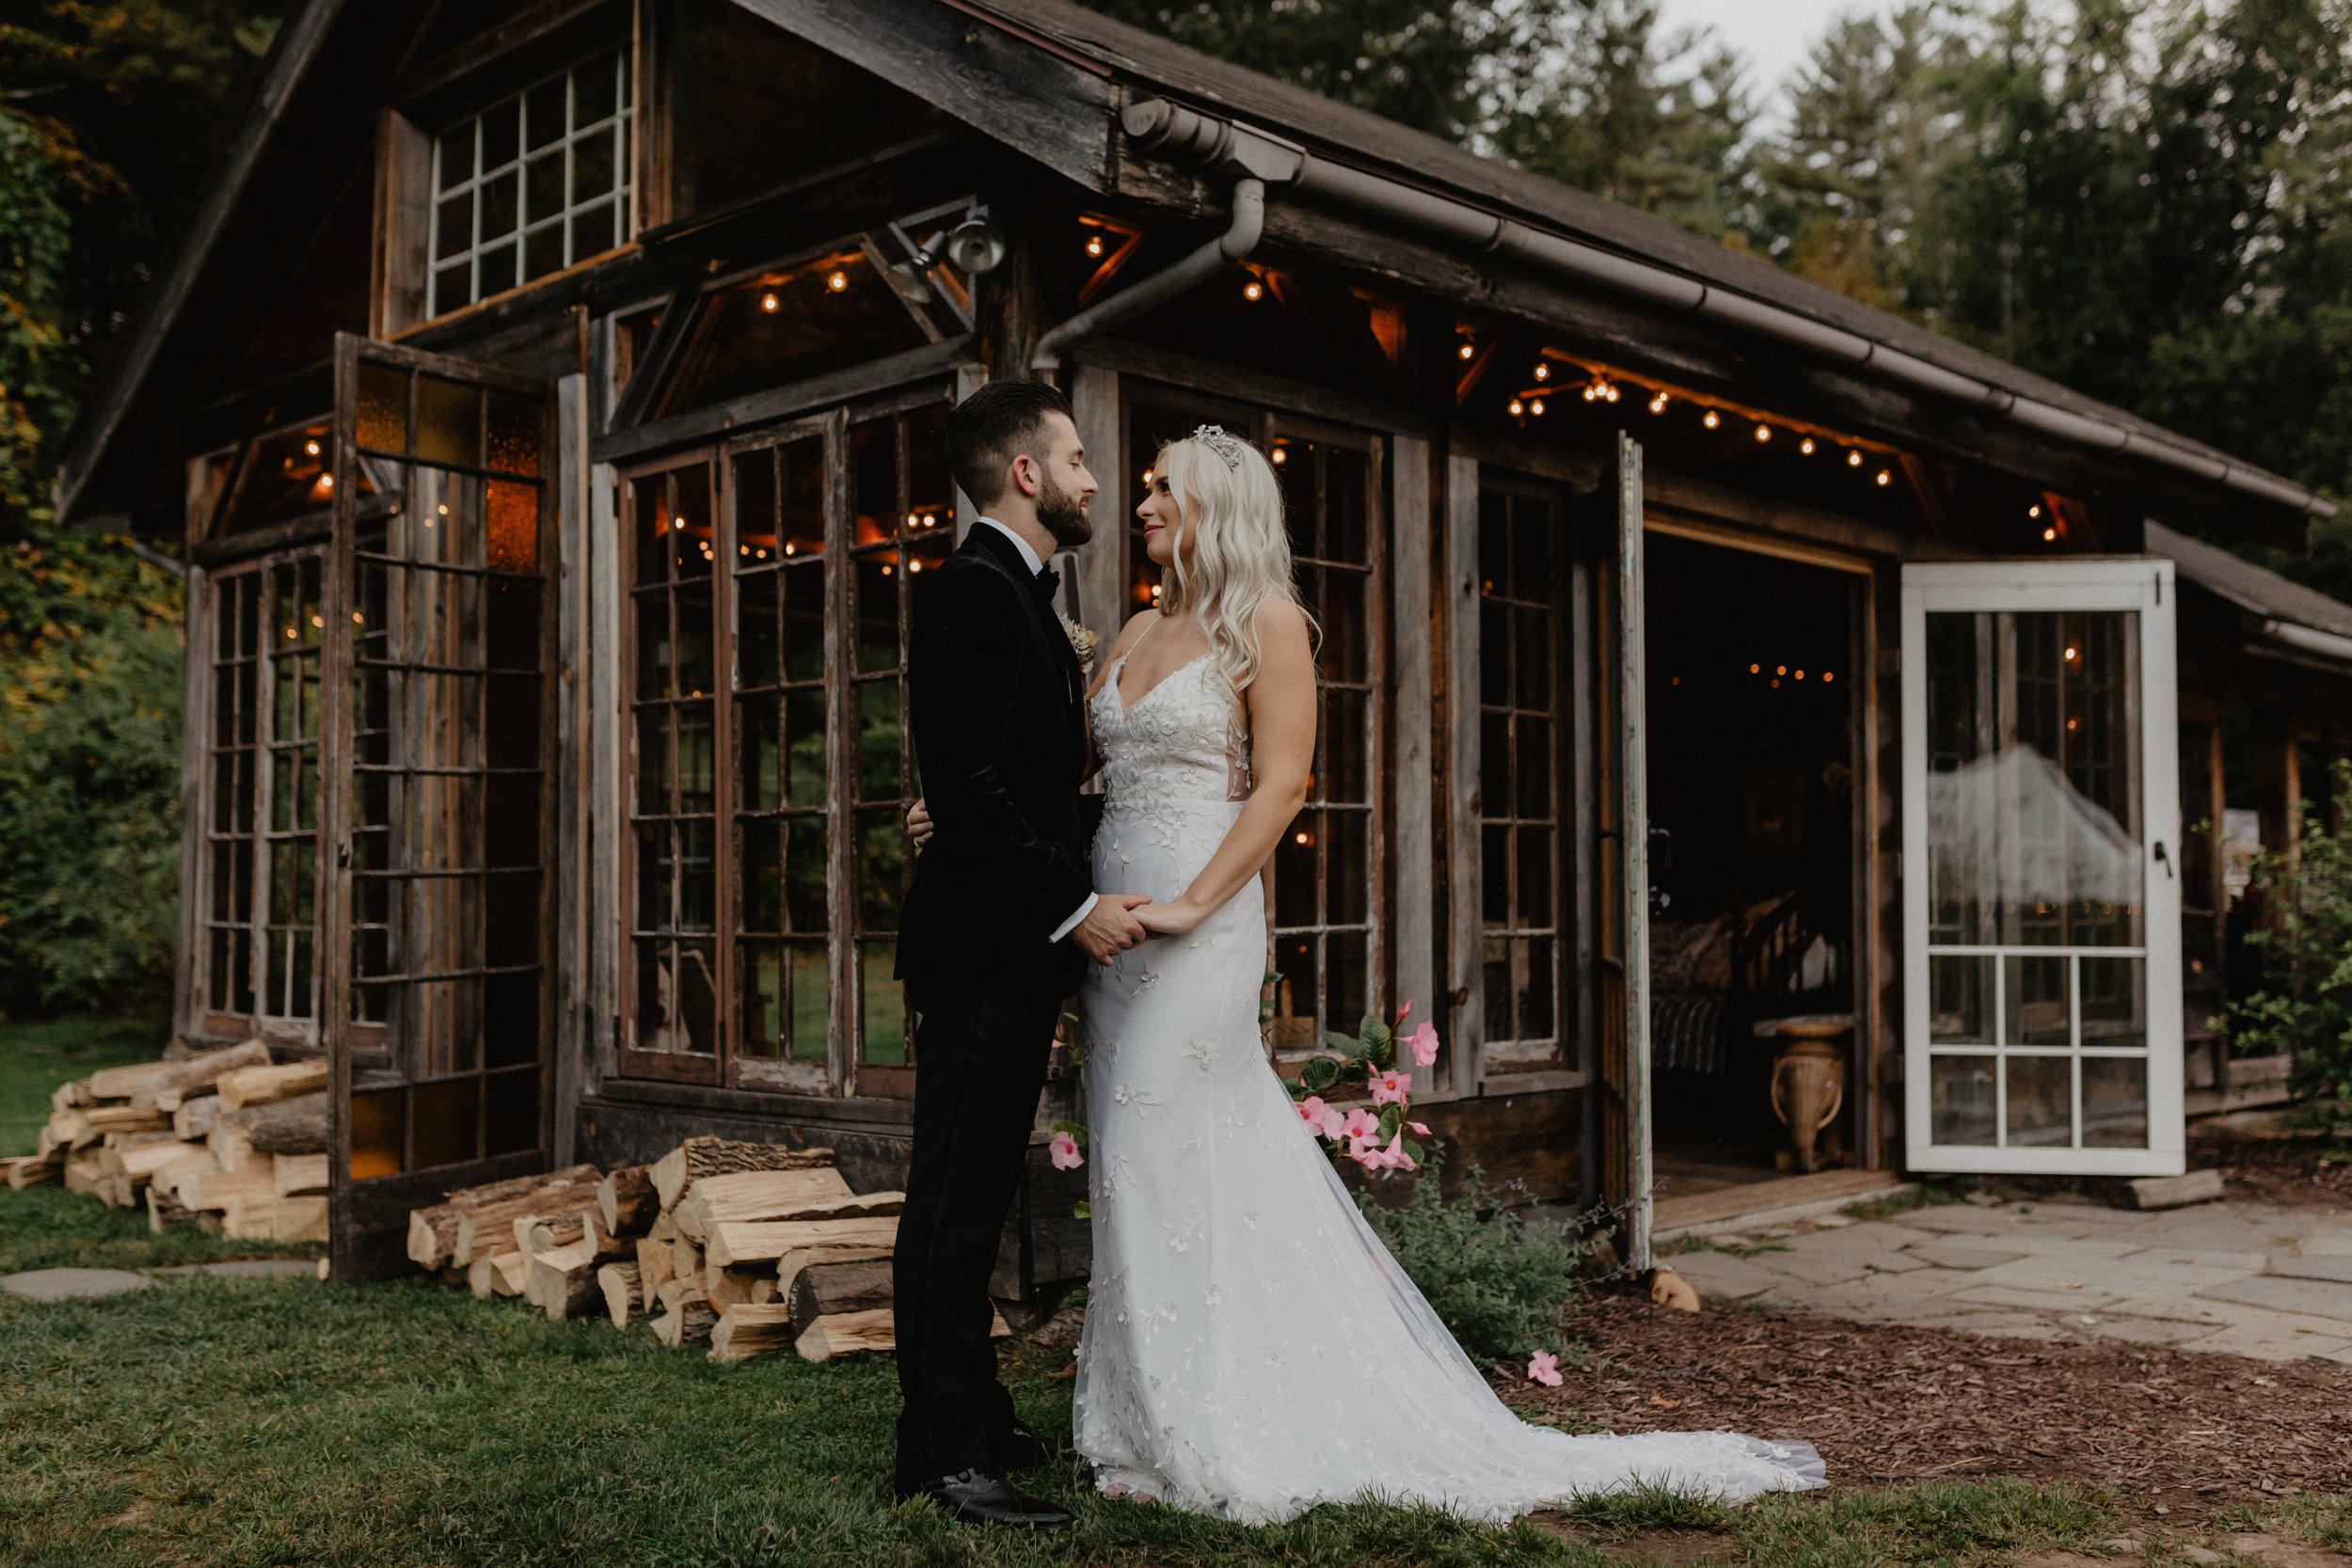 foxfire-mountain-house-wedding121.jpg